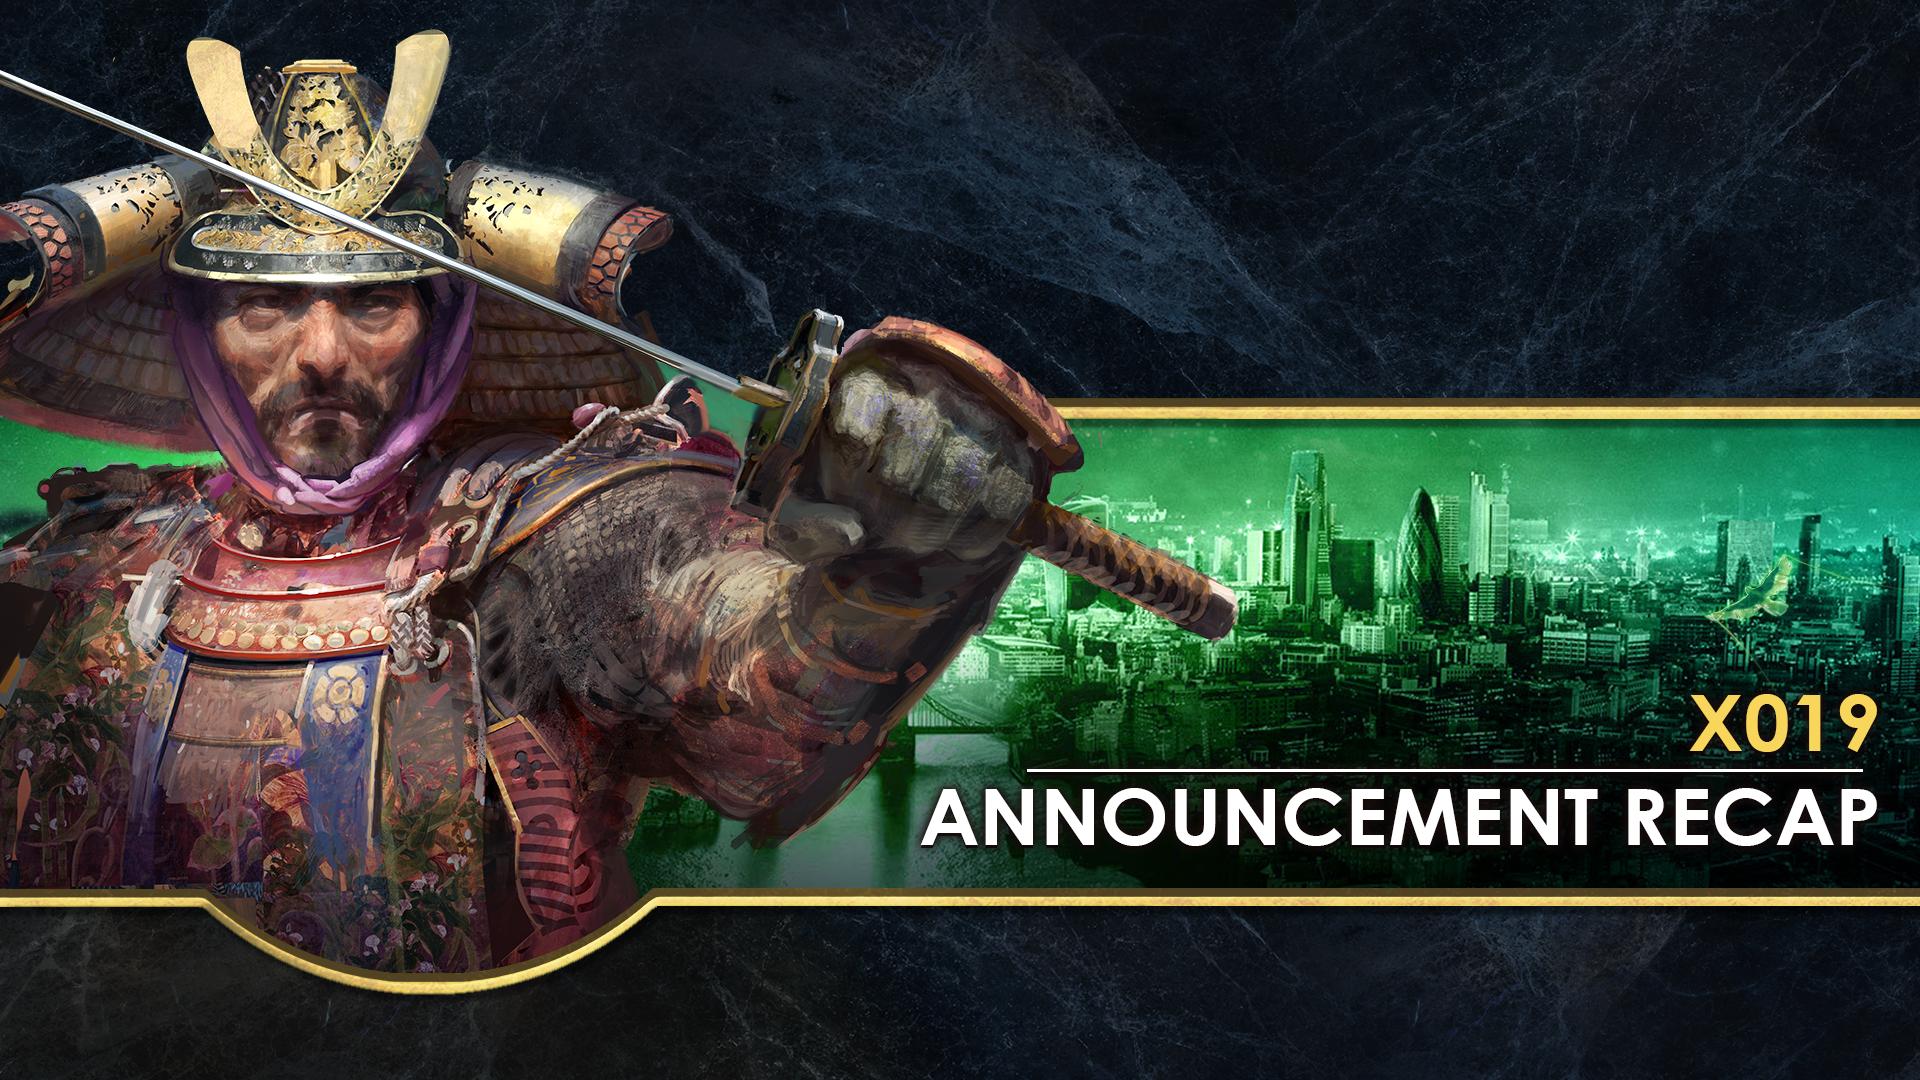 'X019 Announcement Recap' thumbnail